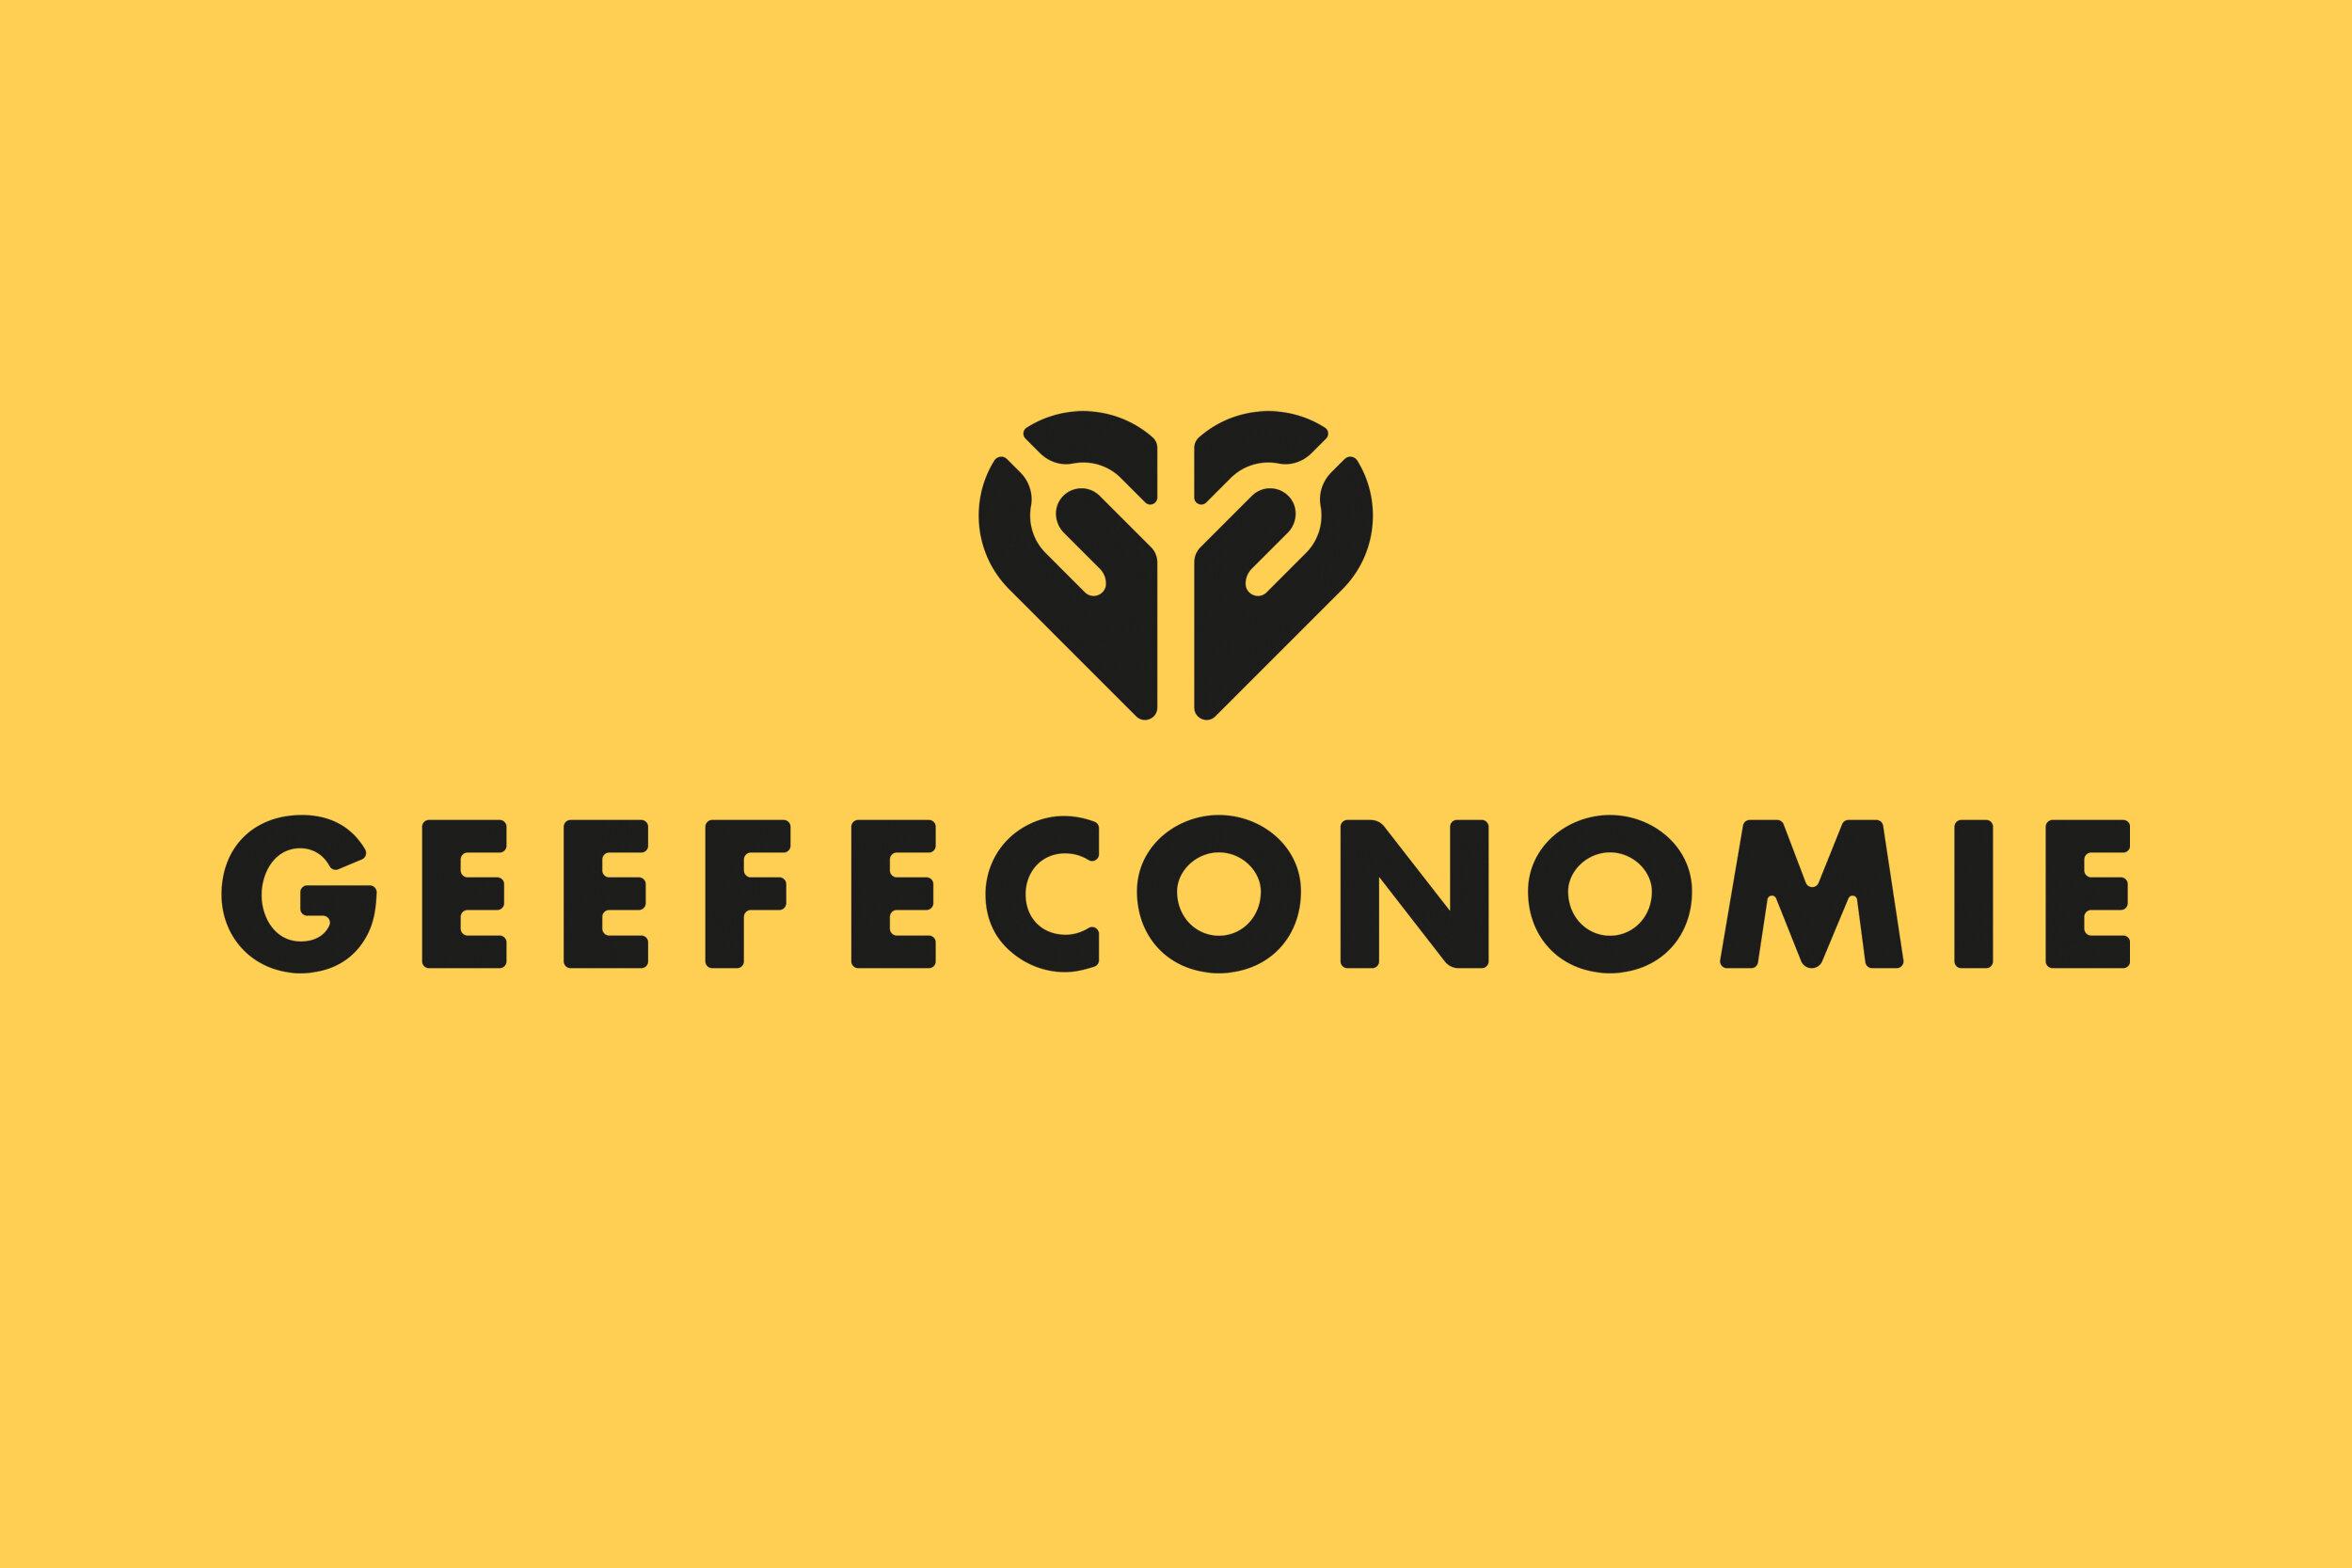 Logo_Geefeconomie1_Shortlife.jpg